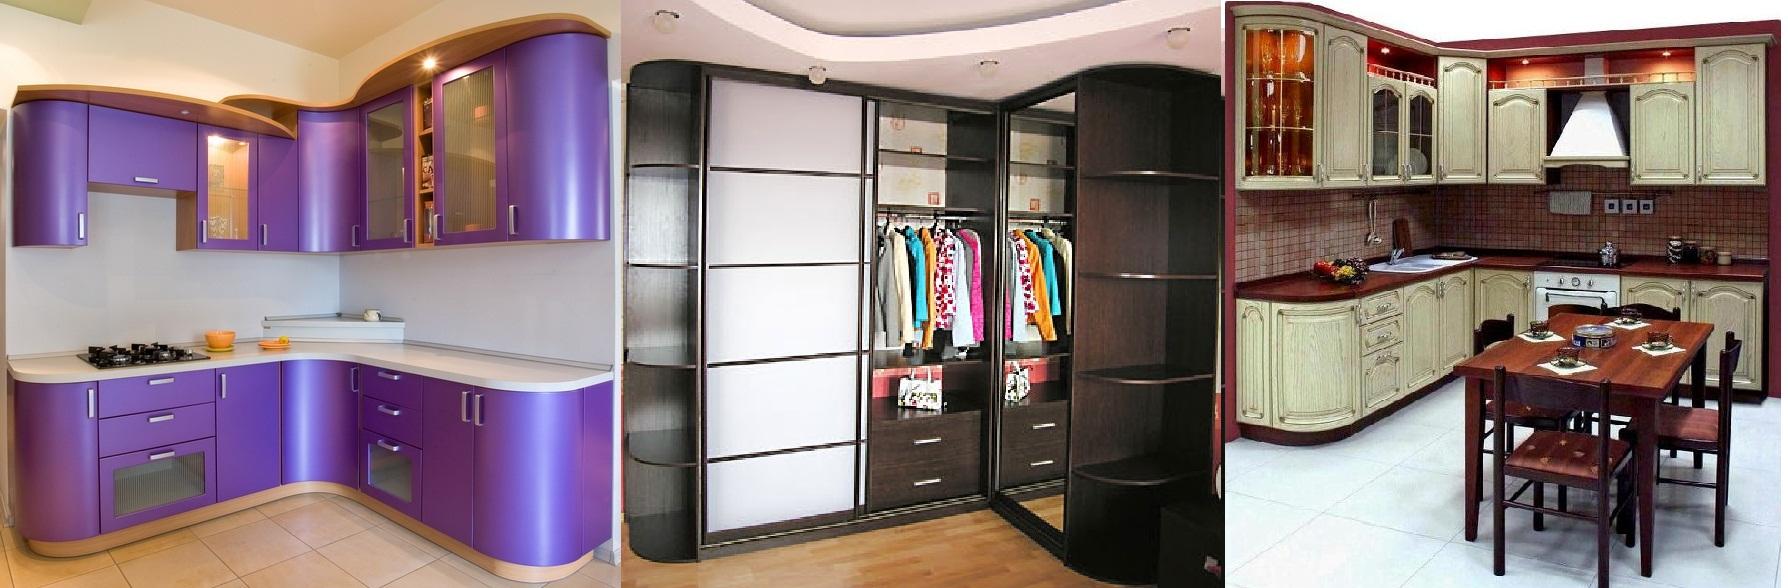 кухонные шкафы фото с размерами